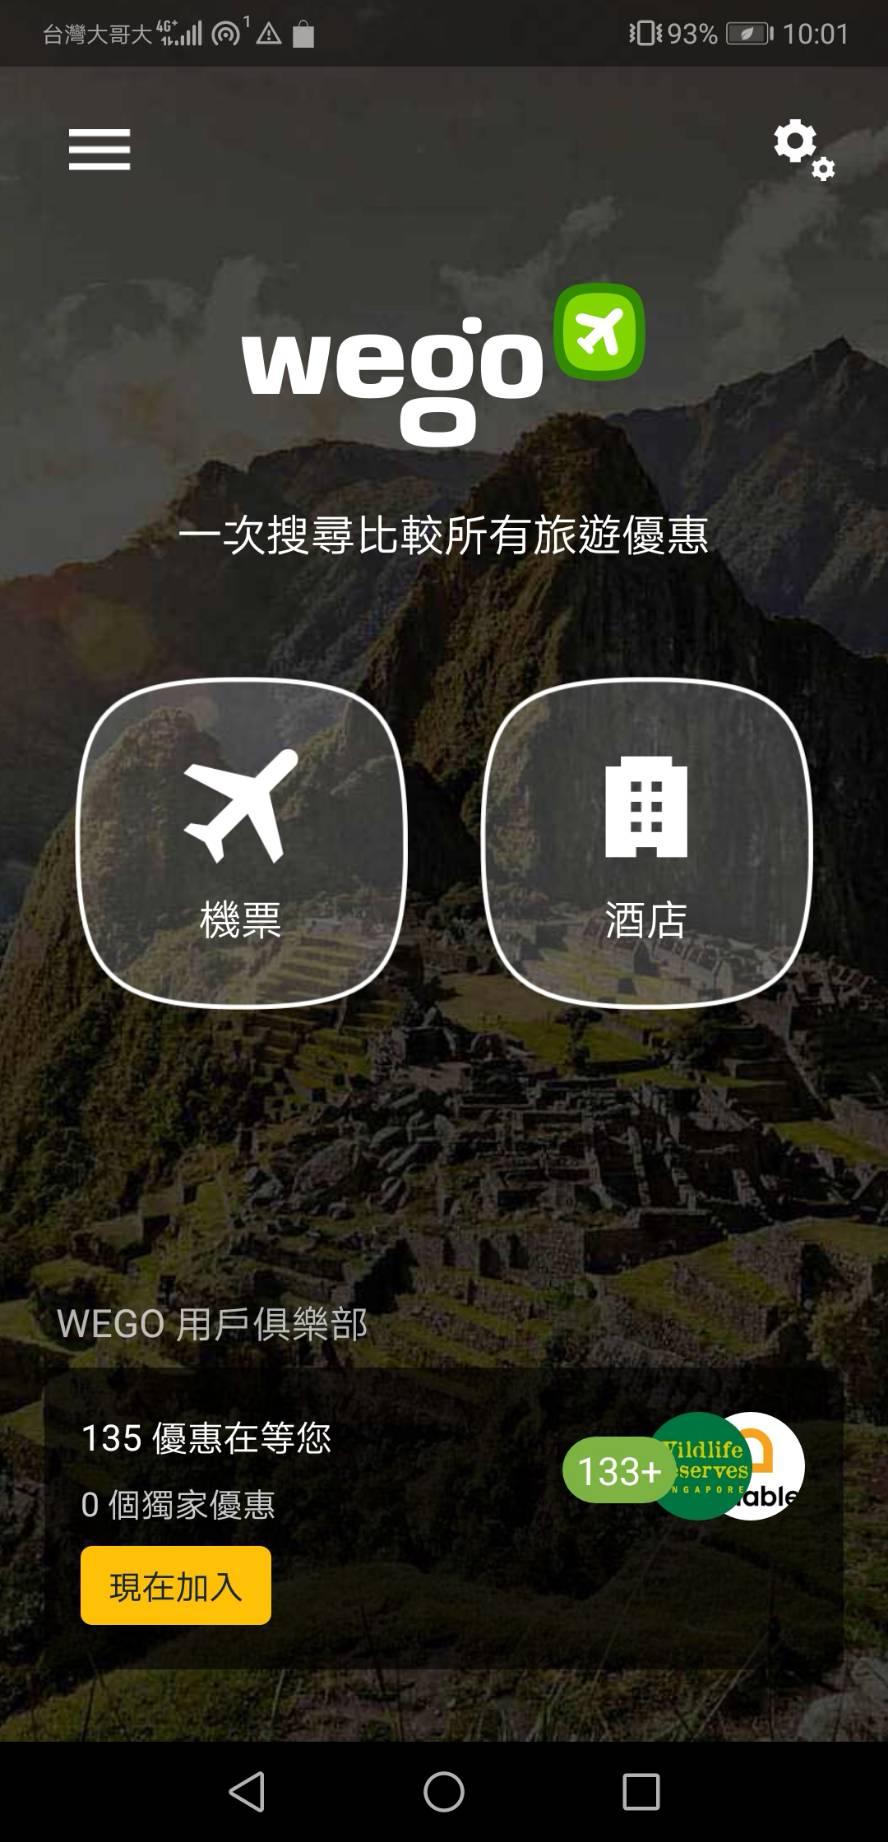 【Wego與我旅遊】機票比價與住宿比價一次搞定!自由行必備網站! @陳小沁の吃喝玩樂